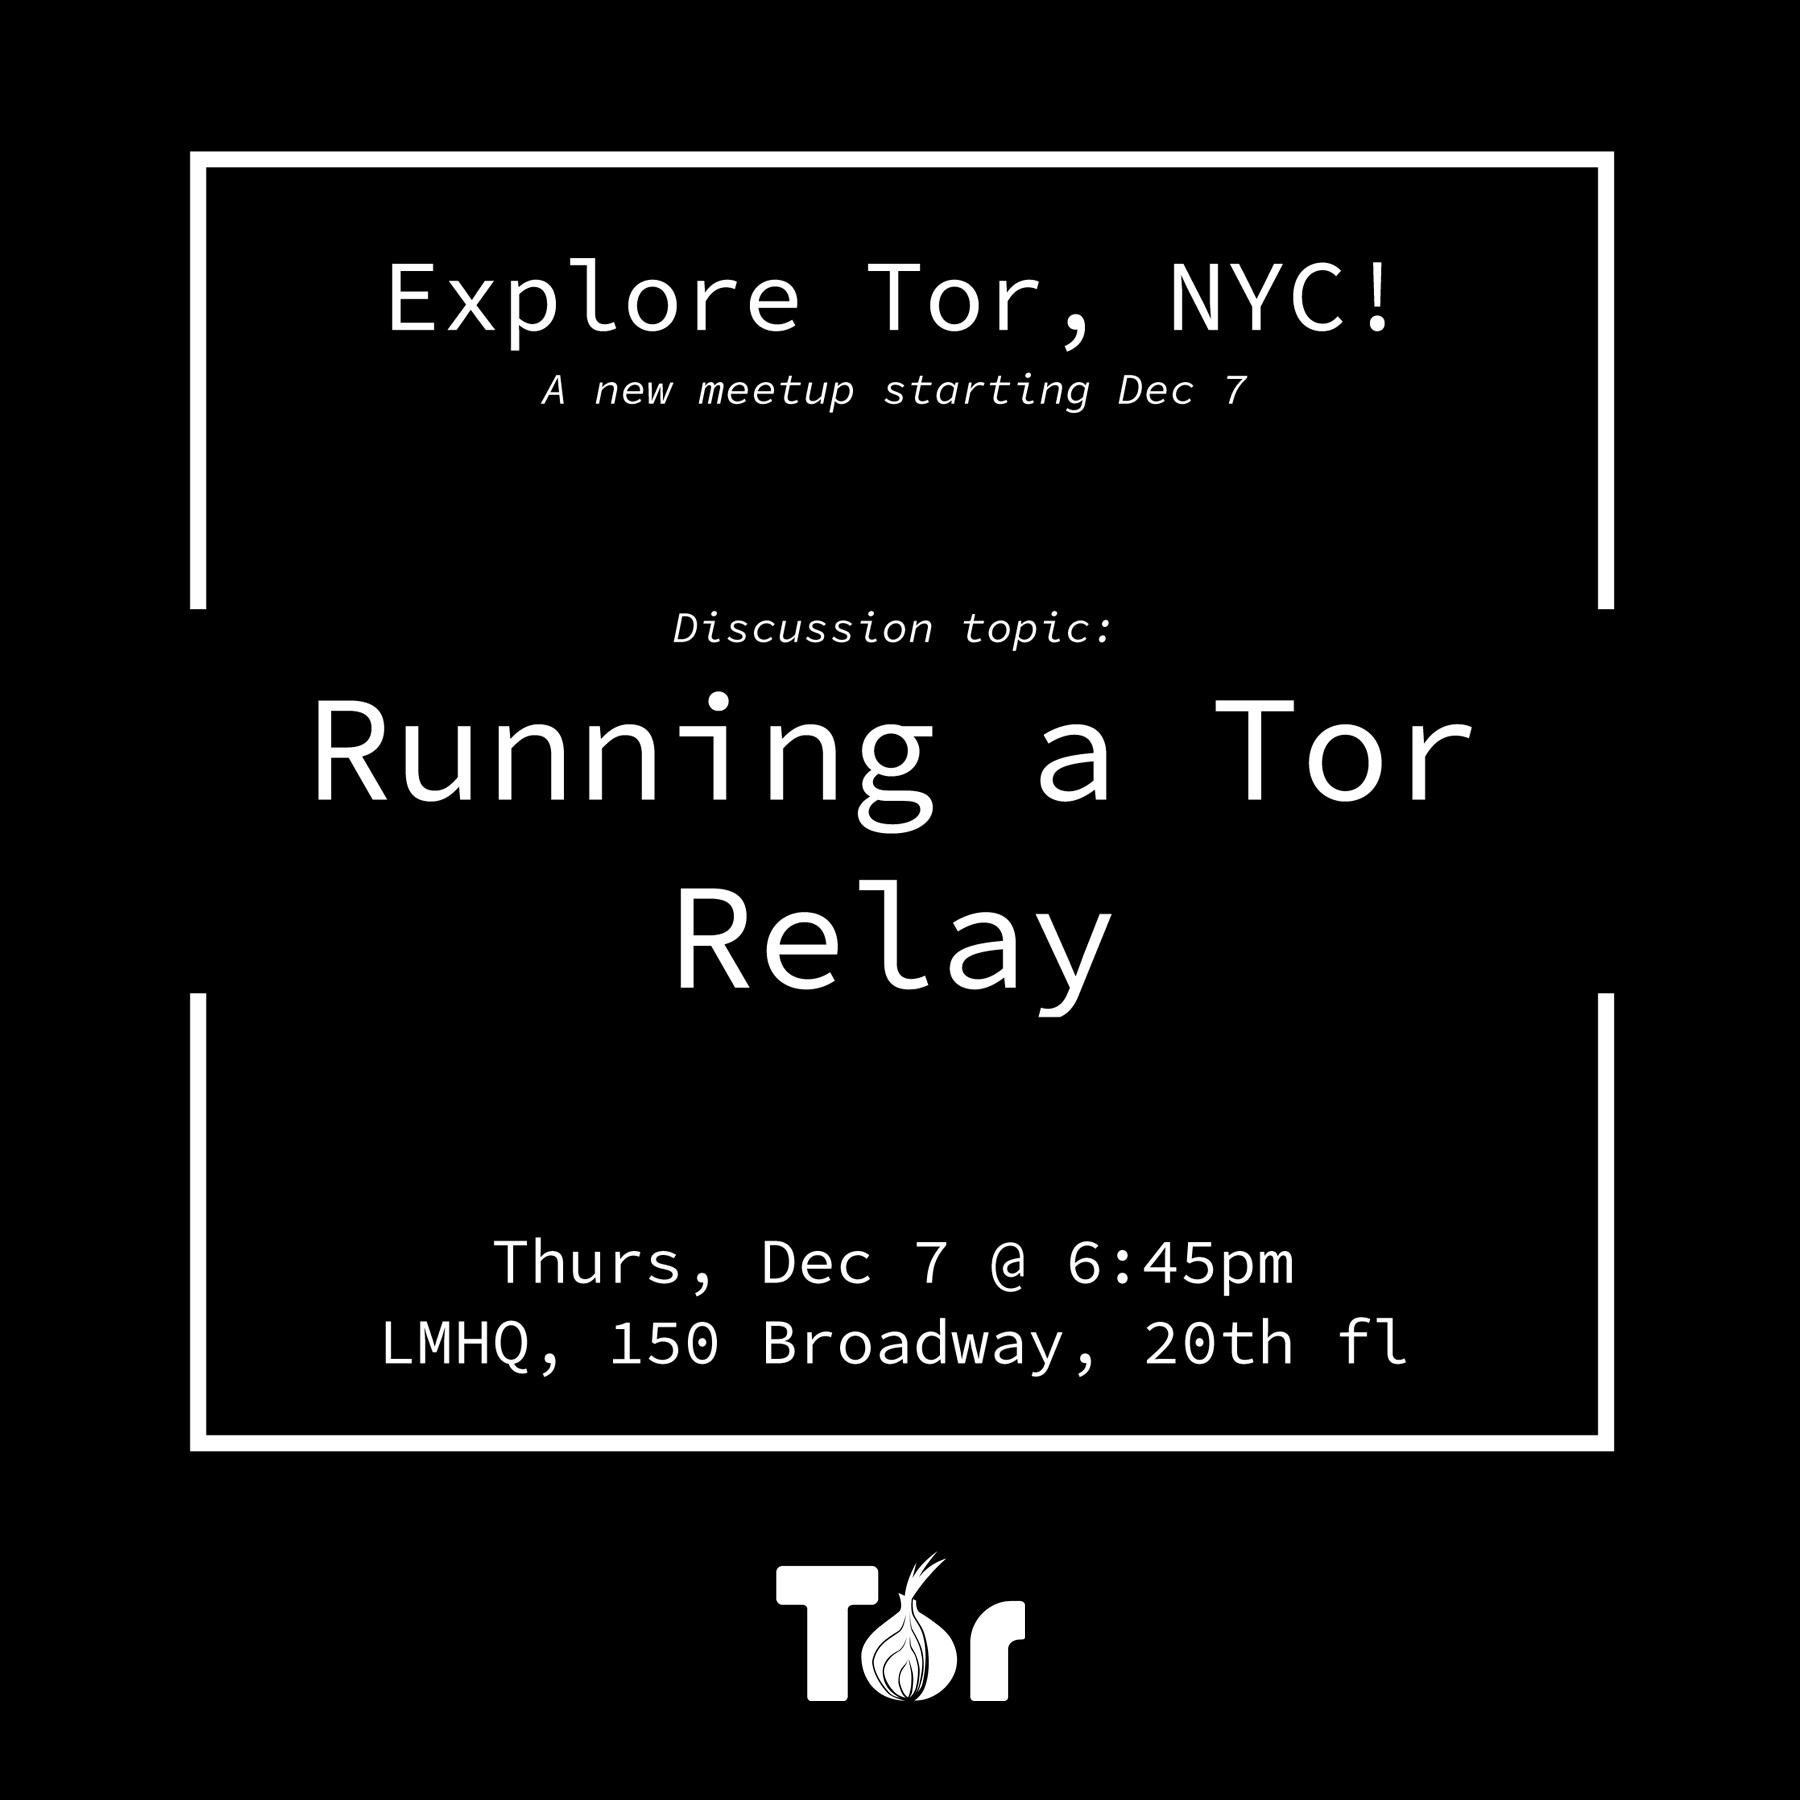 explore-tor-nyc-run-relay